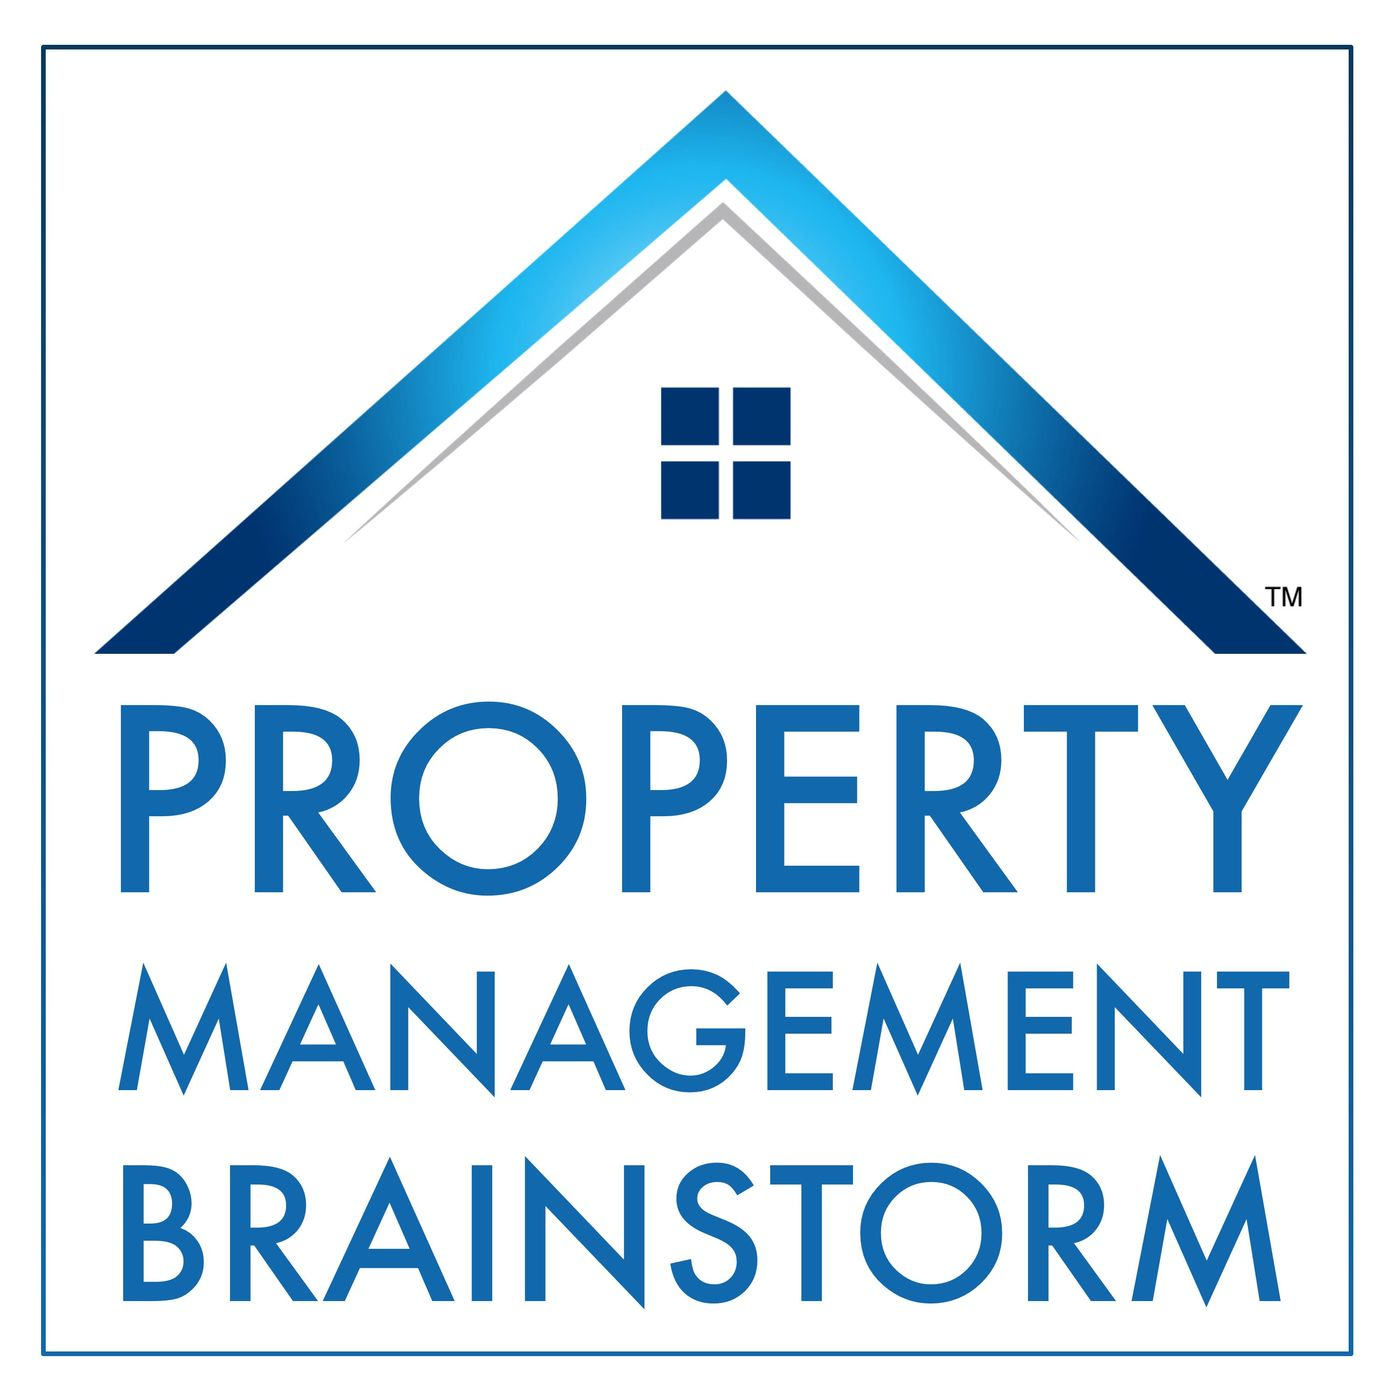 Property Management Brainstorm